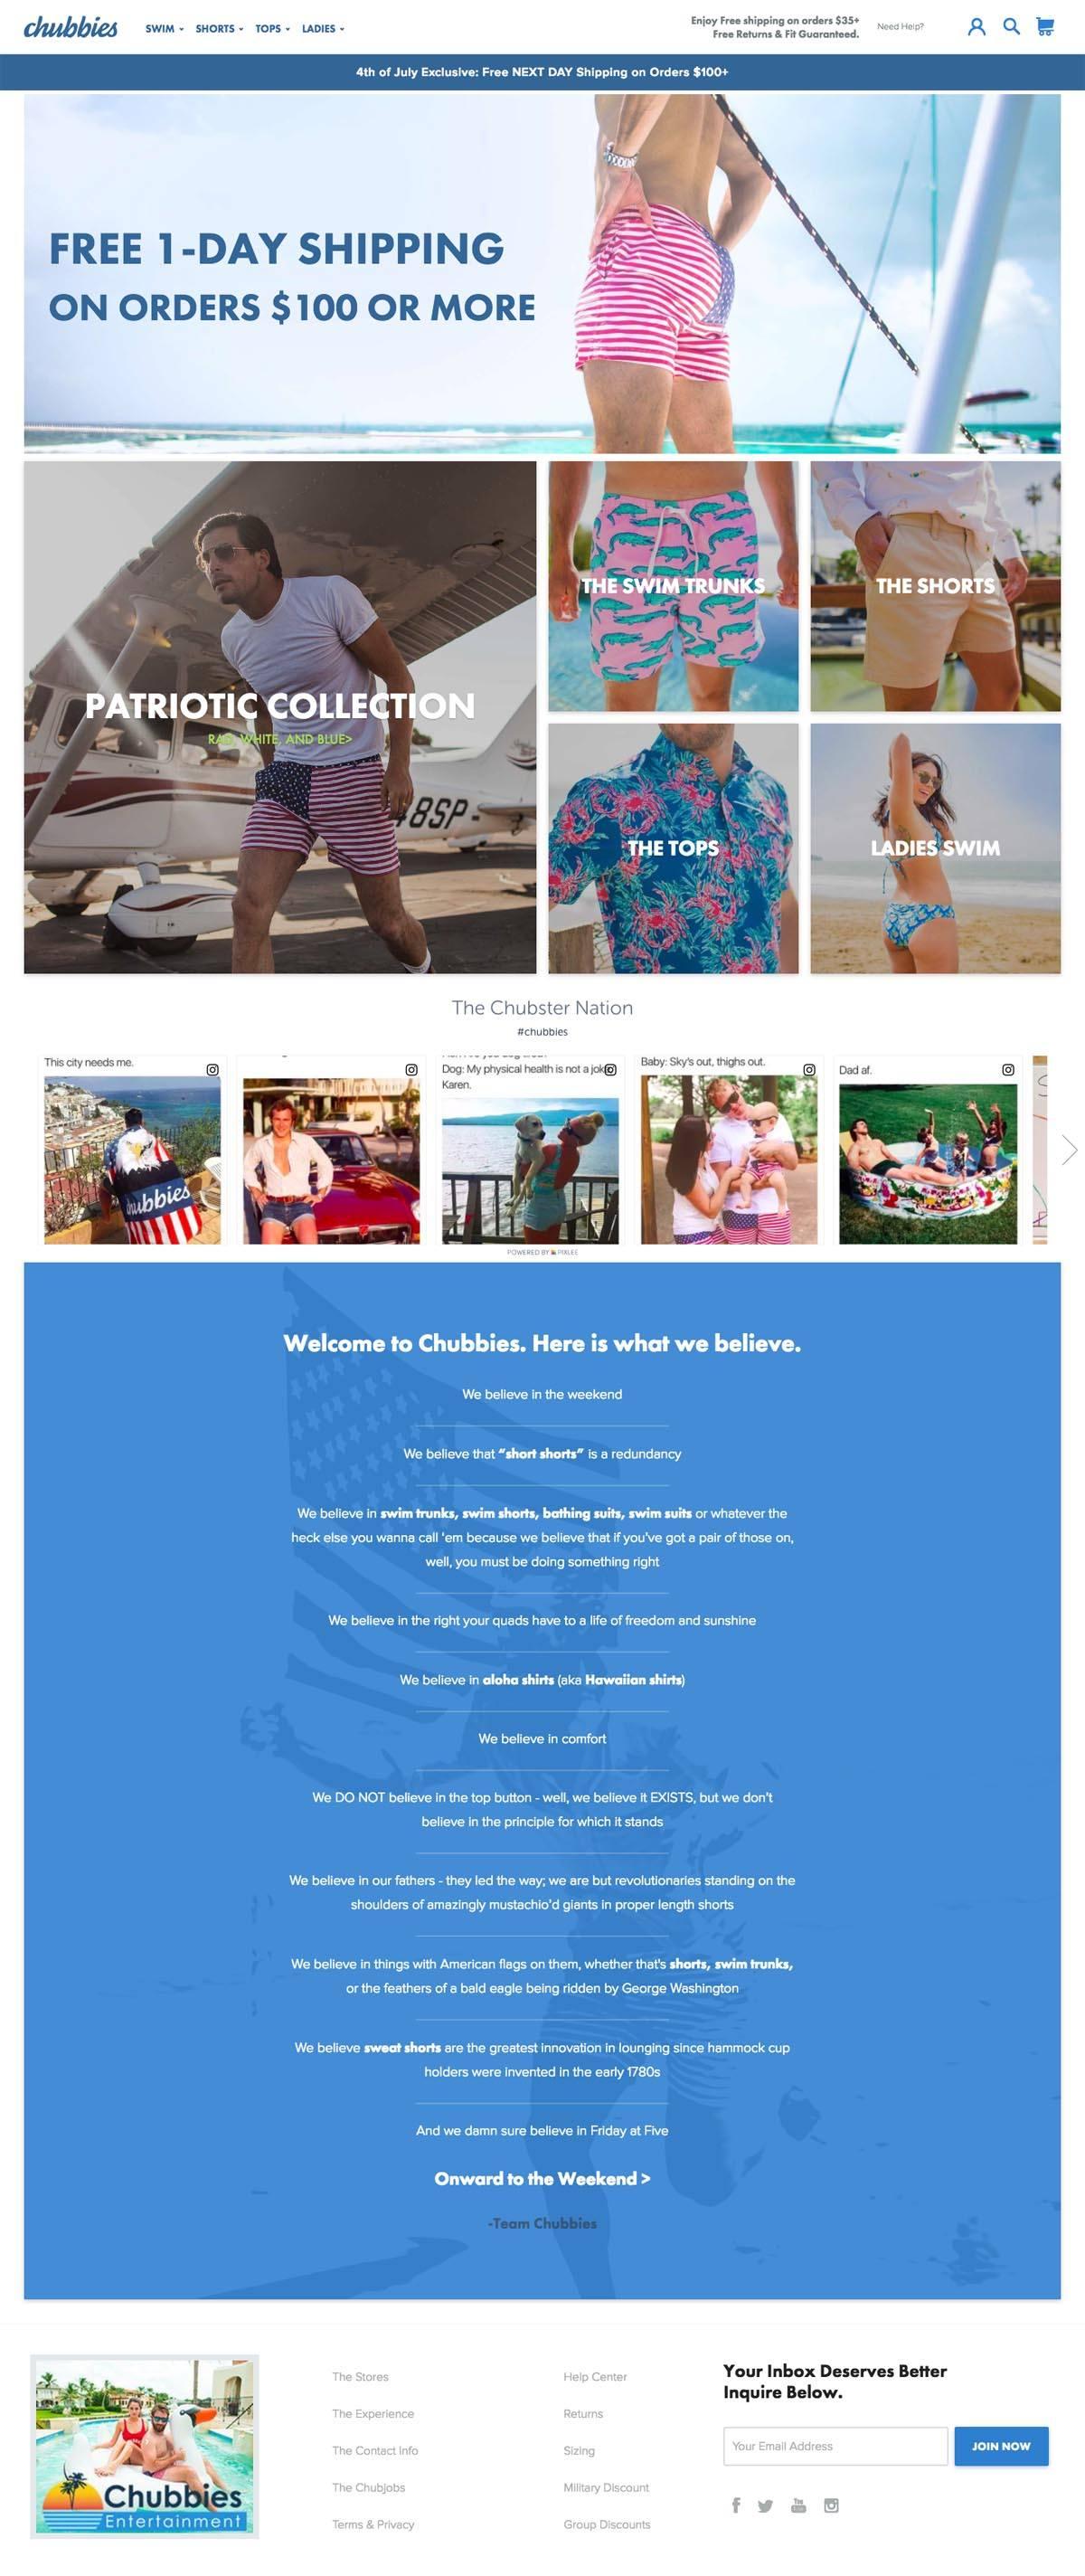 eCommerce website: Chubbies